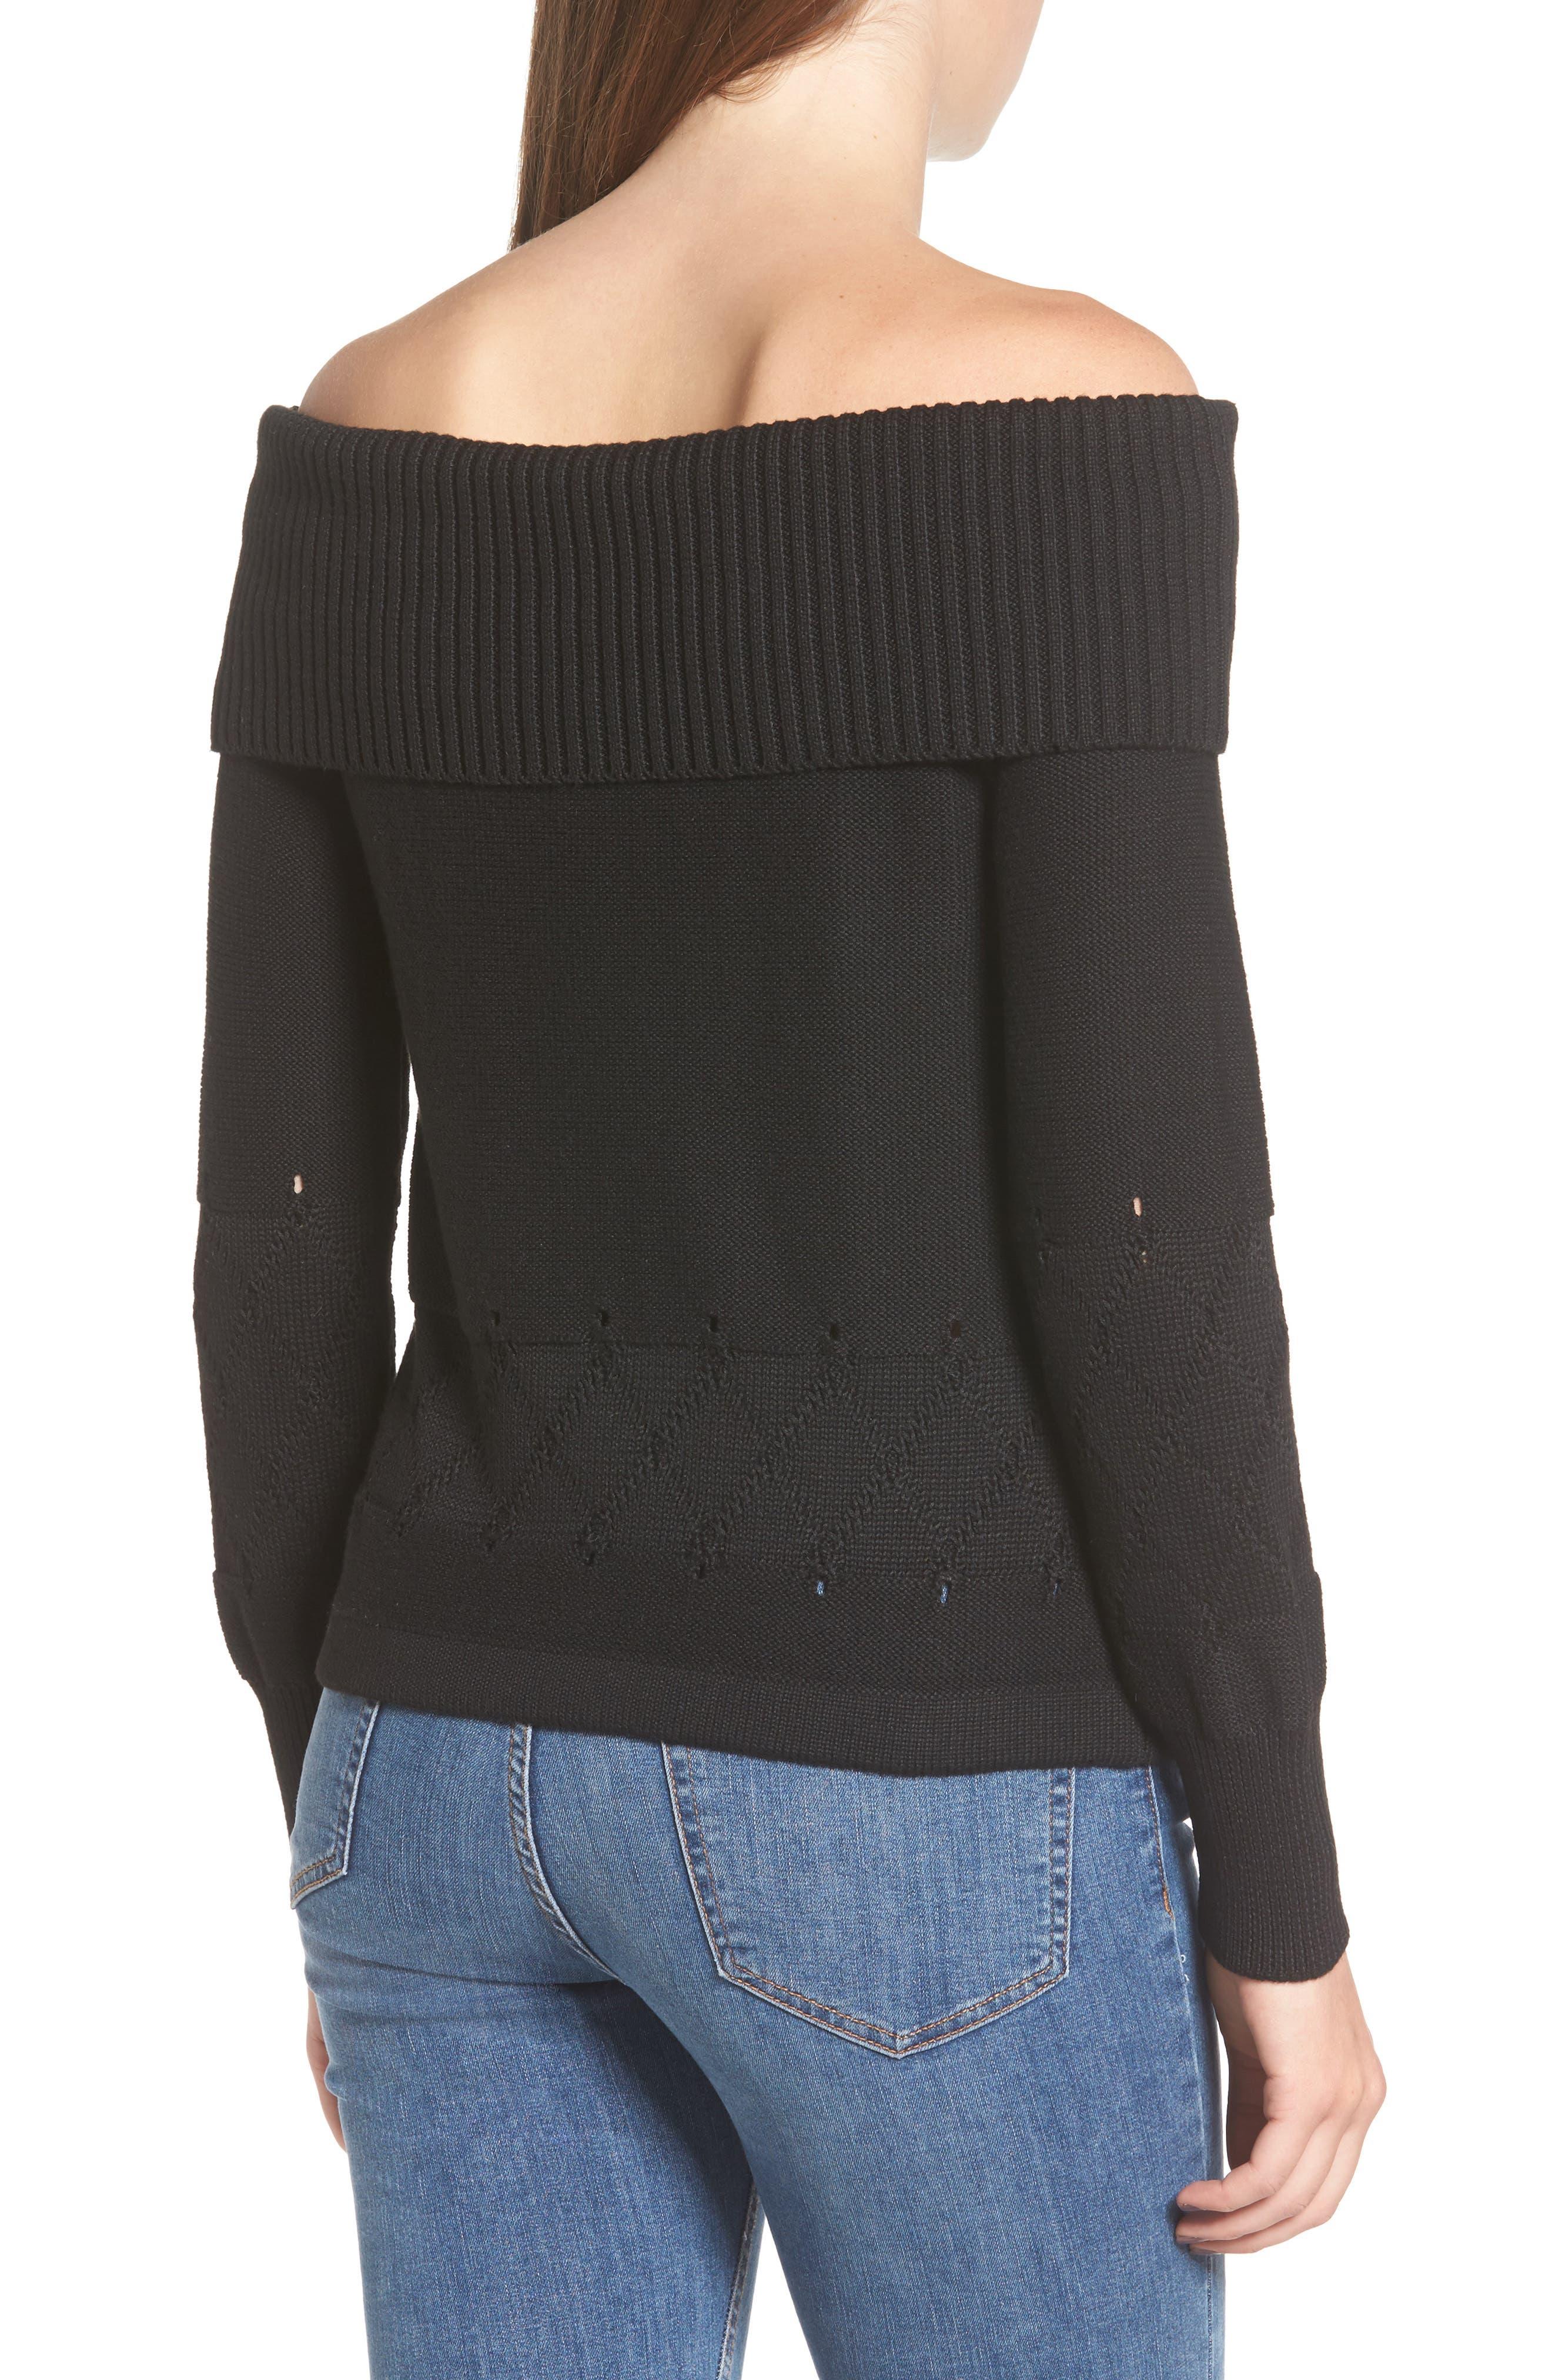 Terri Off the Shoulder Sweater,                             Alternate thumbnail 2, color,                             001